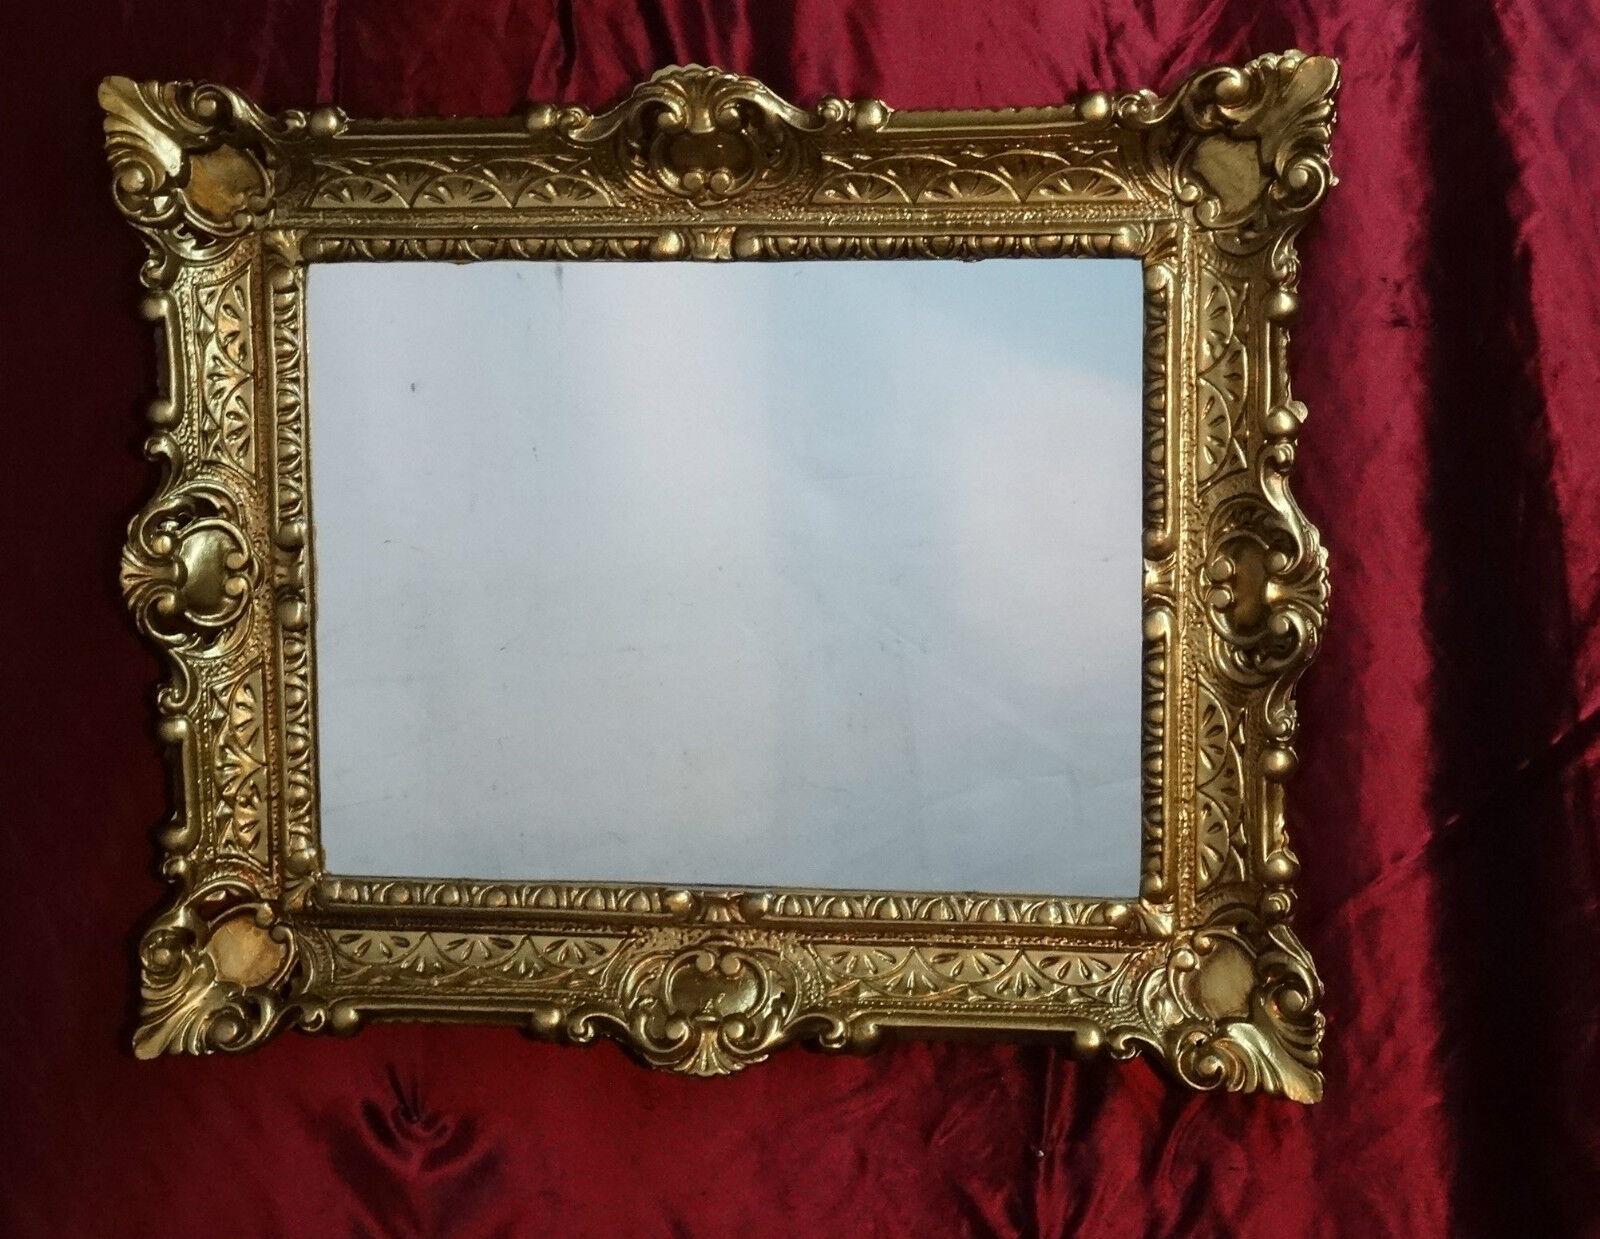 Miroir Miroir Miroir mural avec console miroir armoire 56x46 Antique Baroque 811 entrée meubles Gold 6d27c1